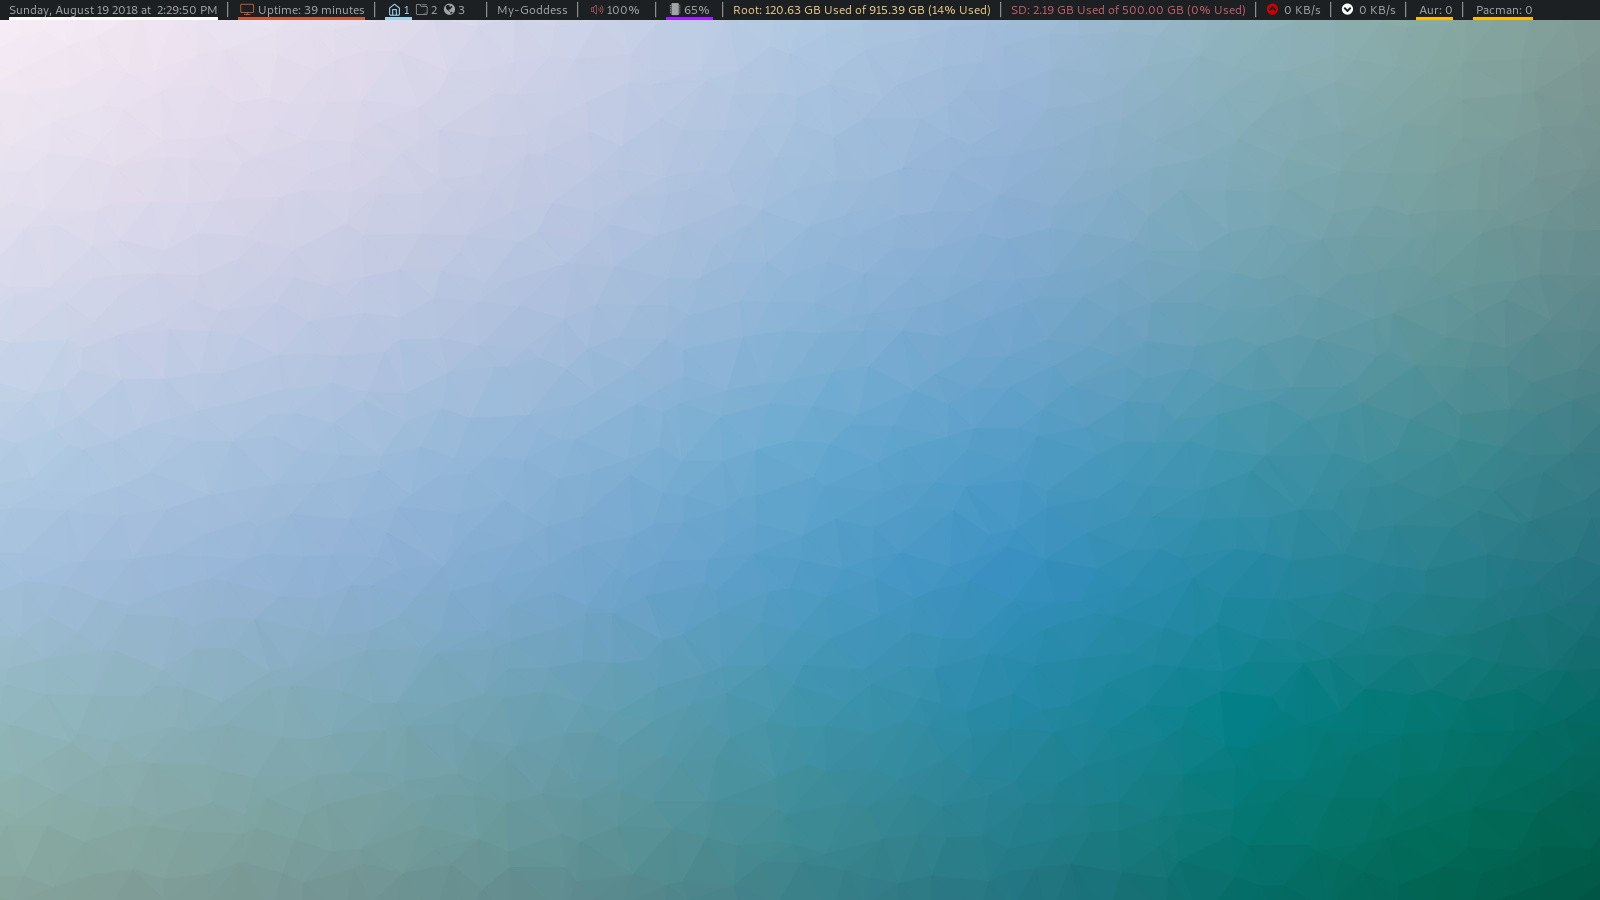 ArchLabs_2018-08-19-50_1600x900